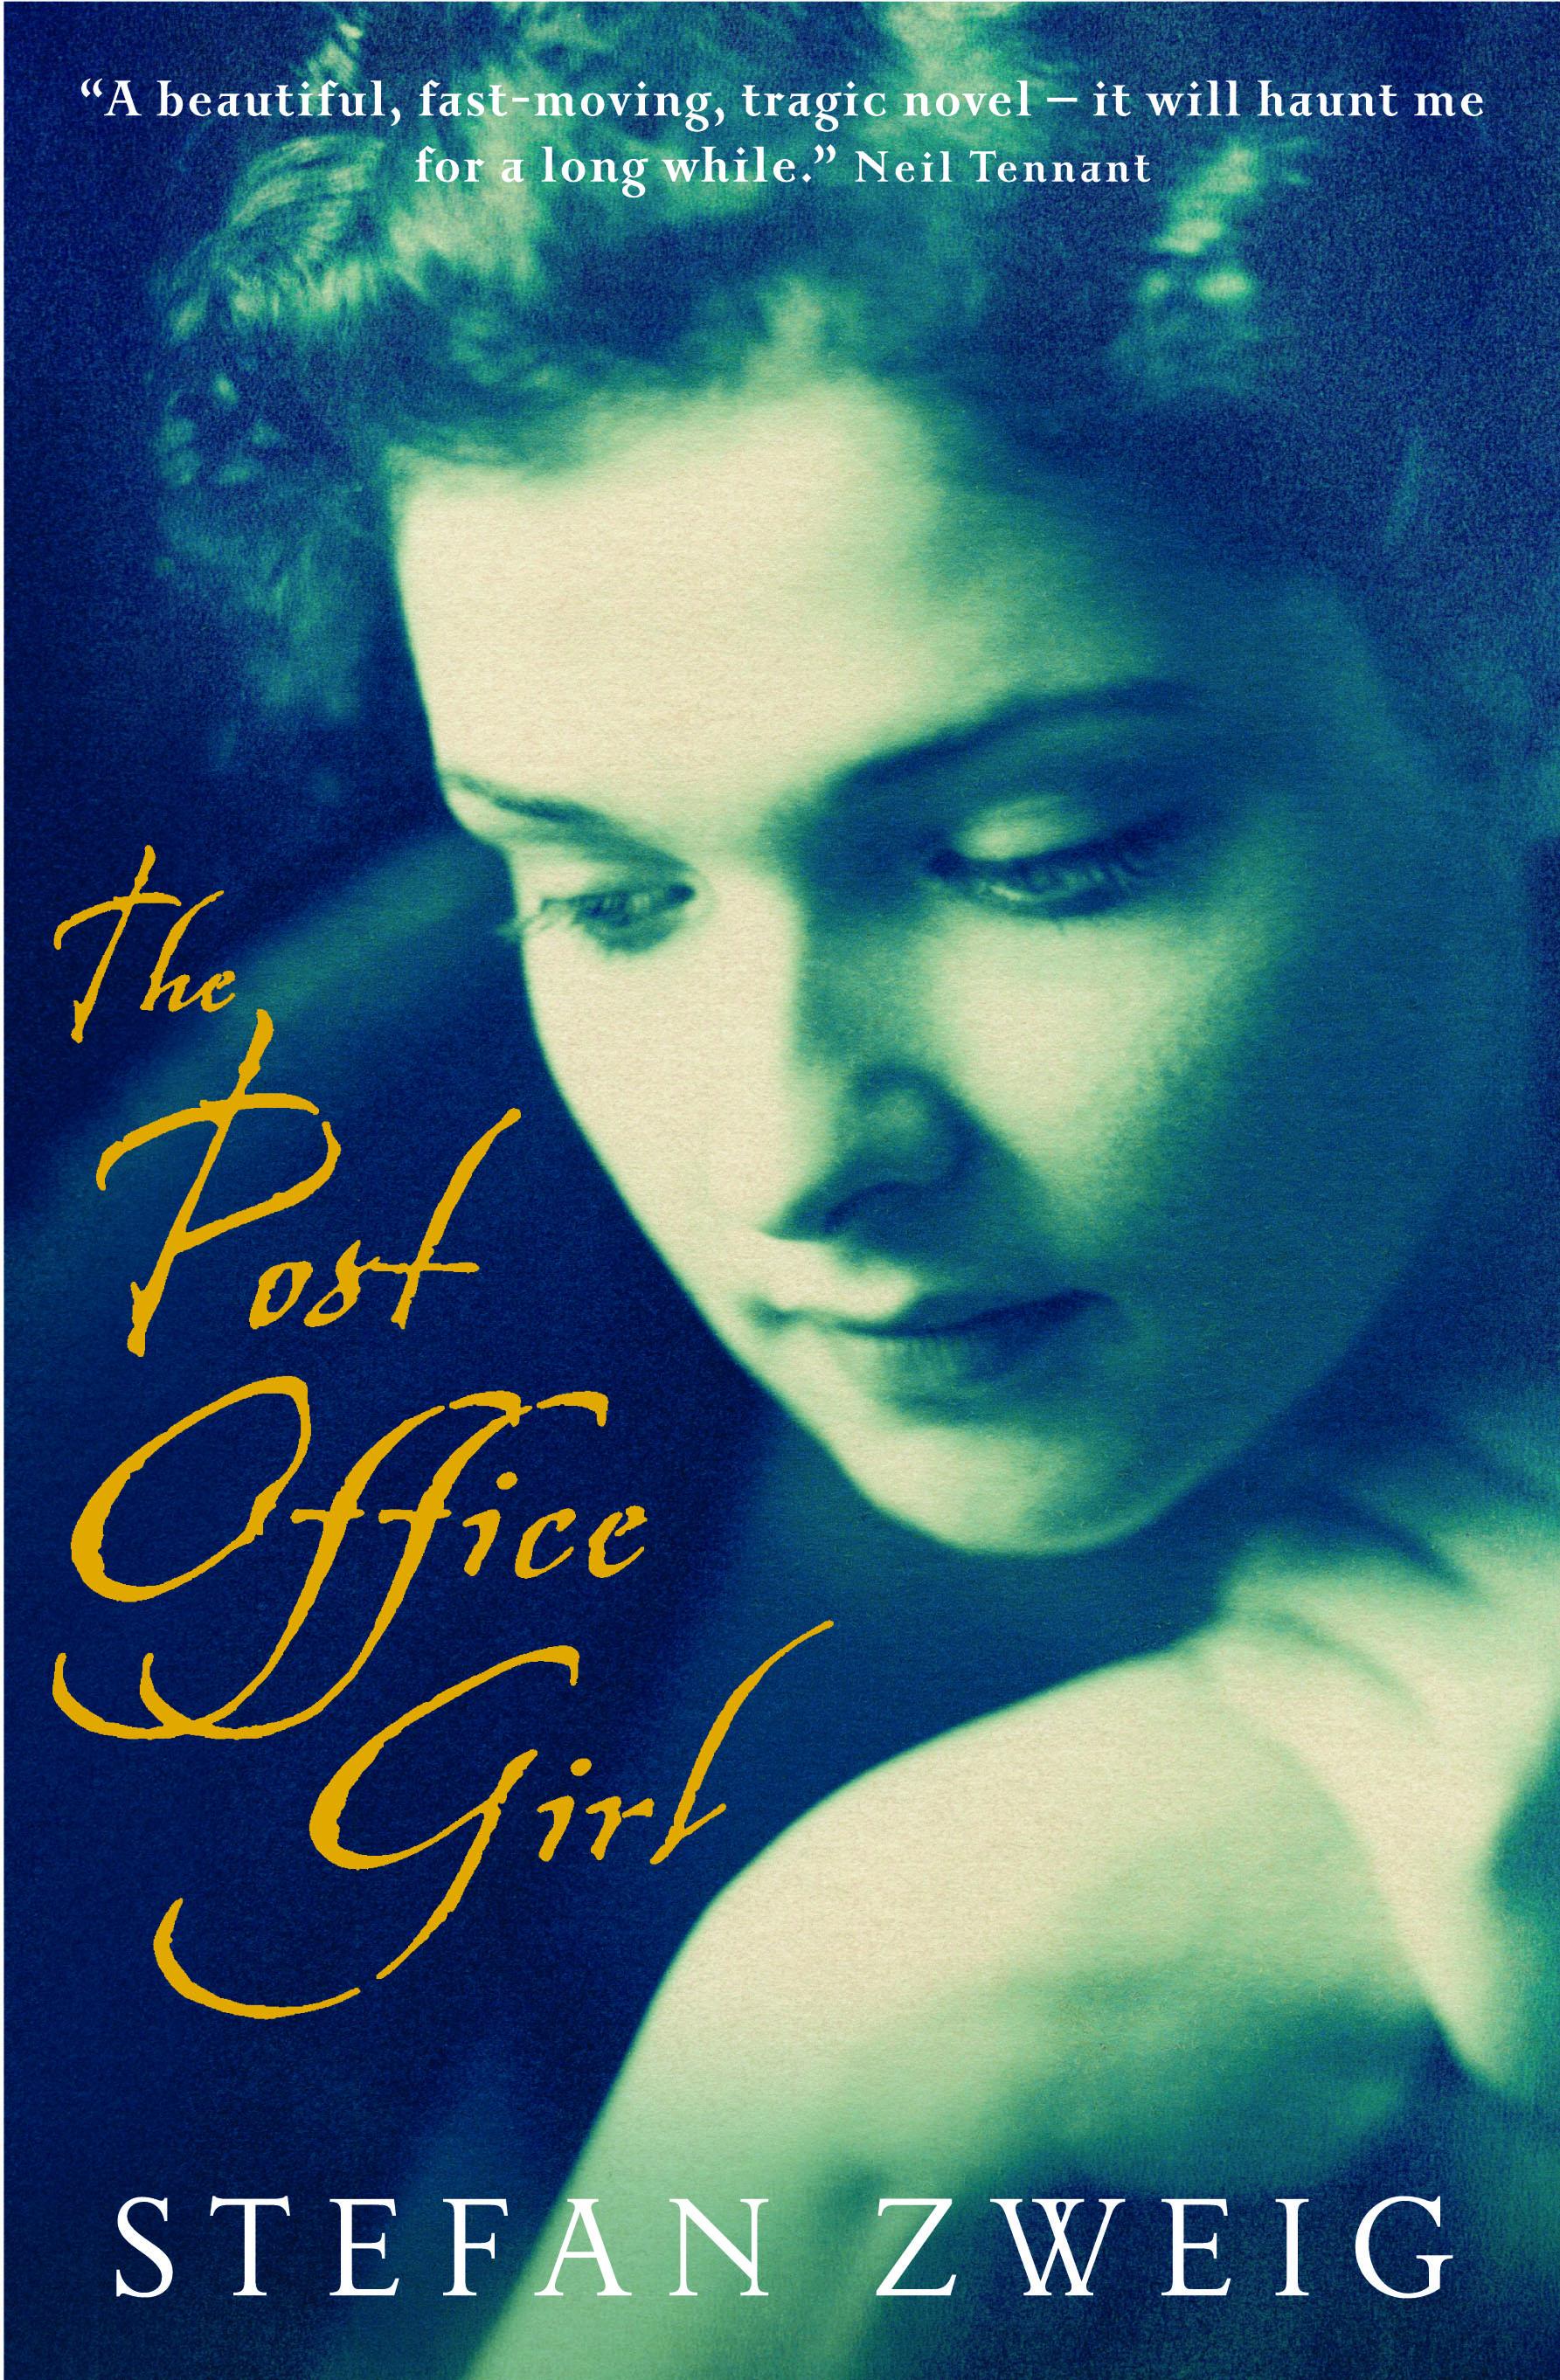 Stefan Zweig The Post Office Girl Sort of Books